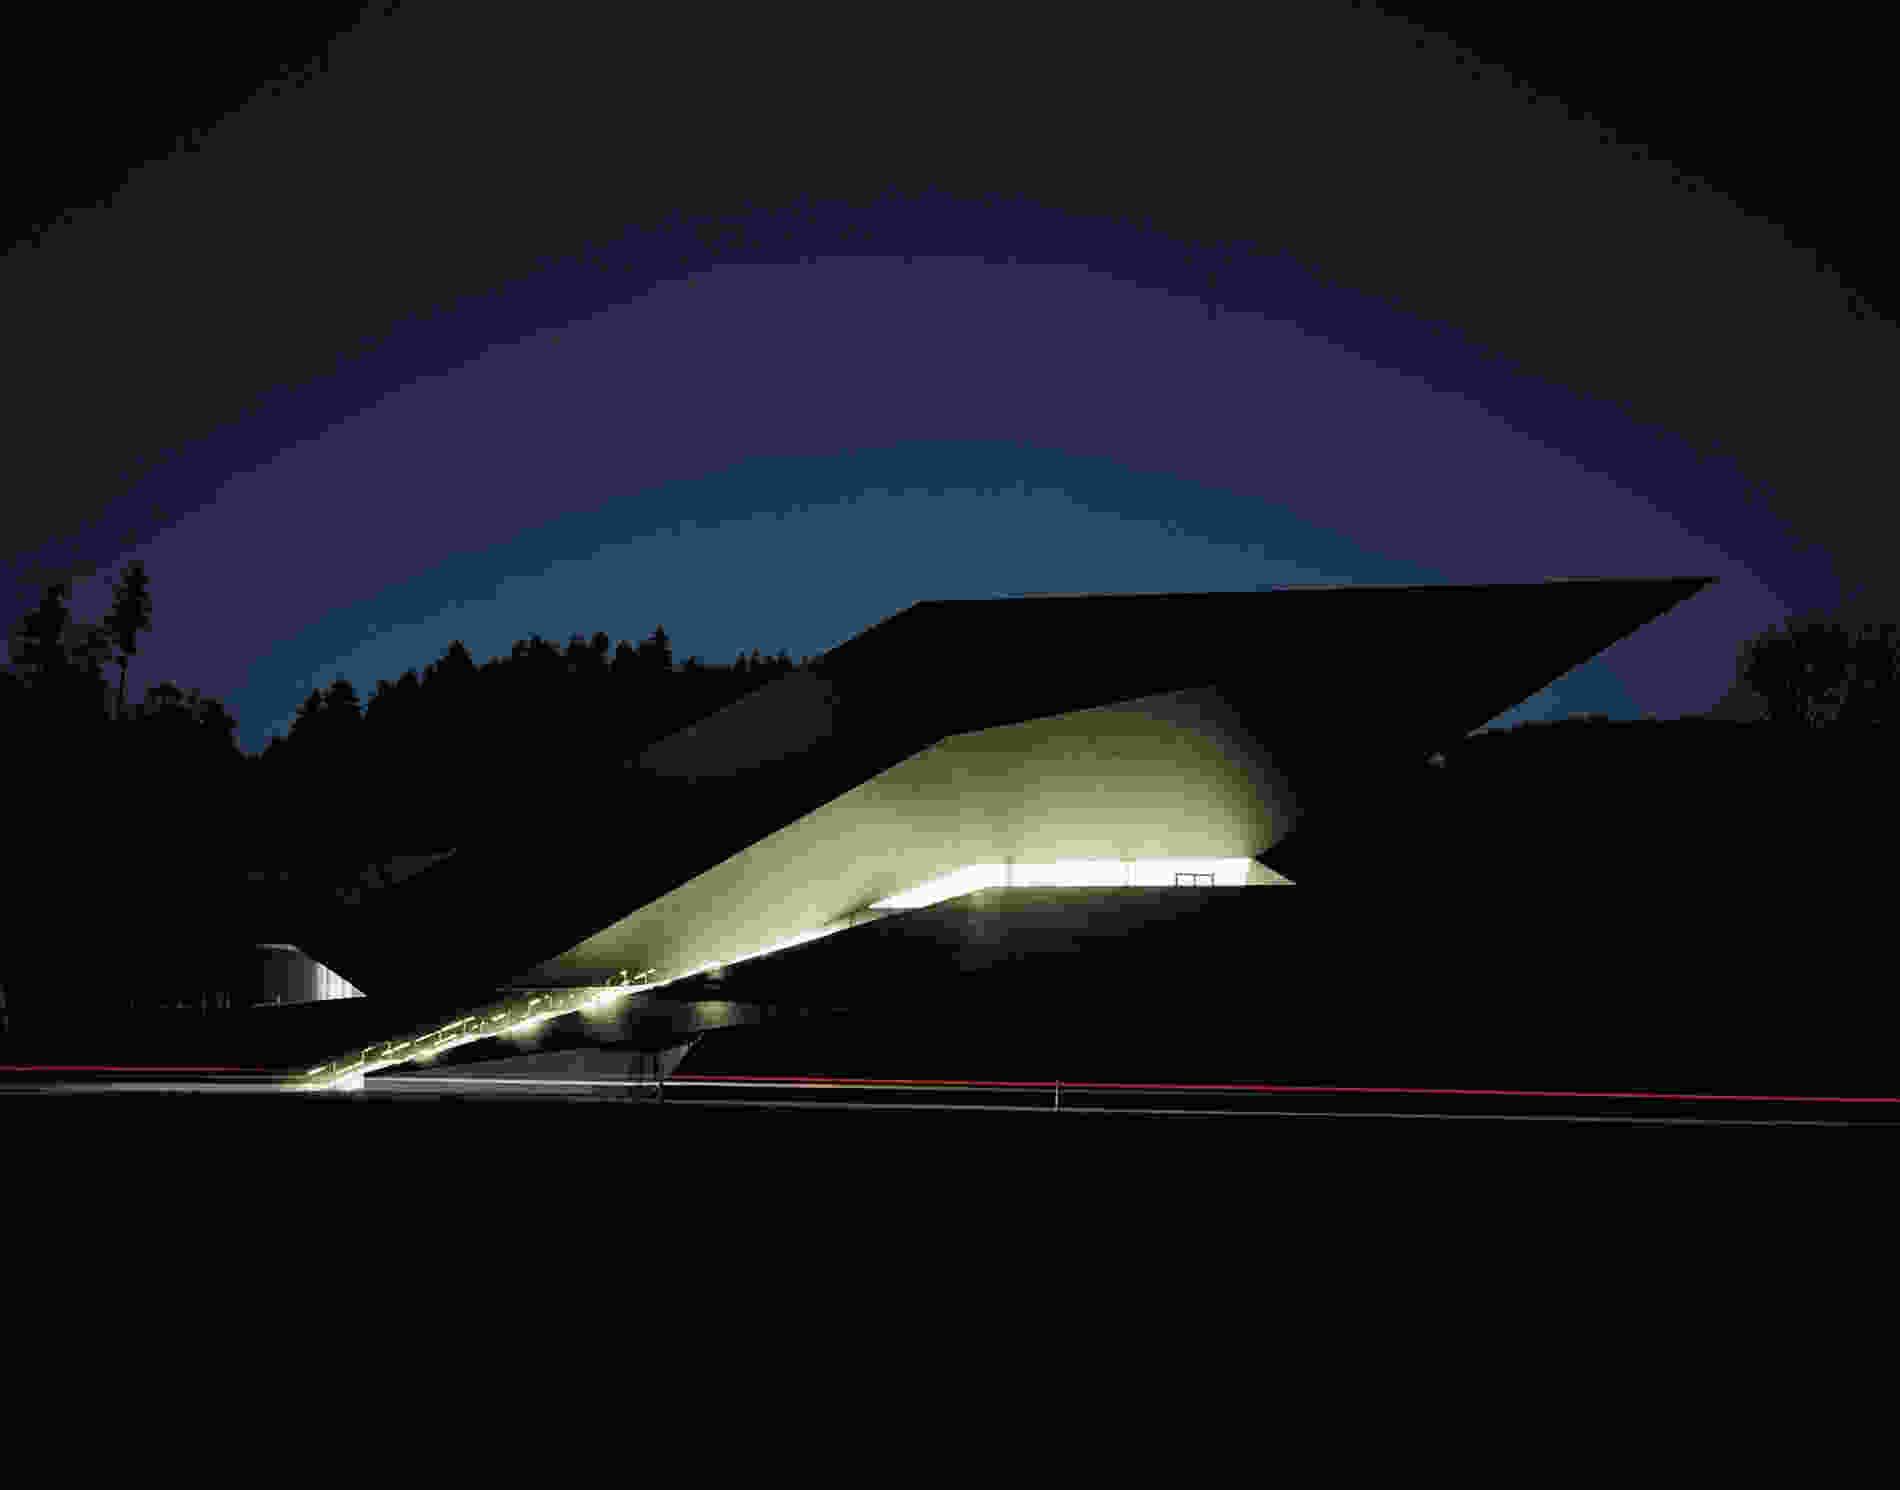 182 Festival Hall Erl bg 006